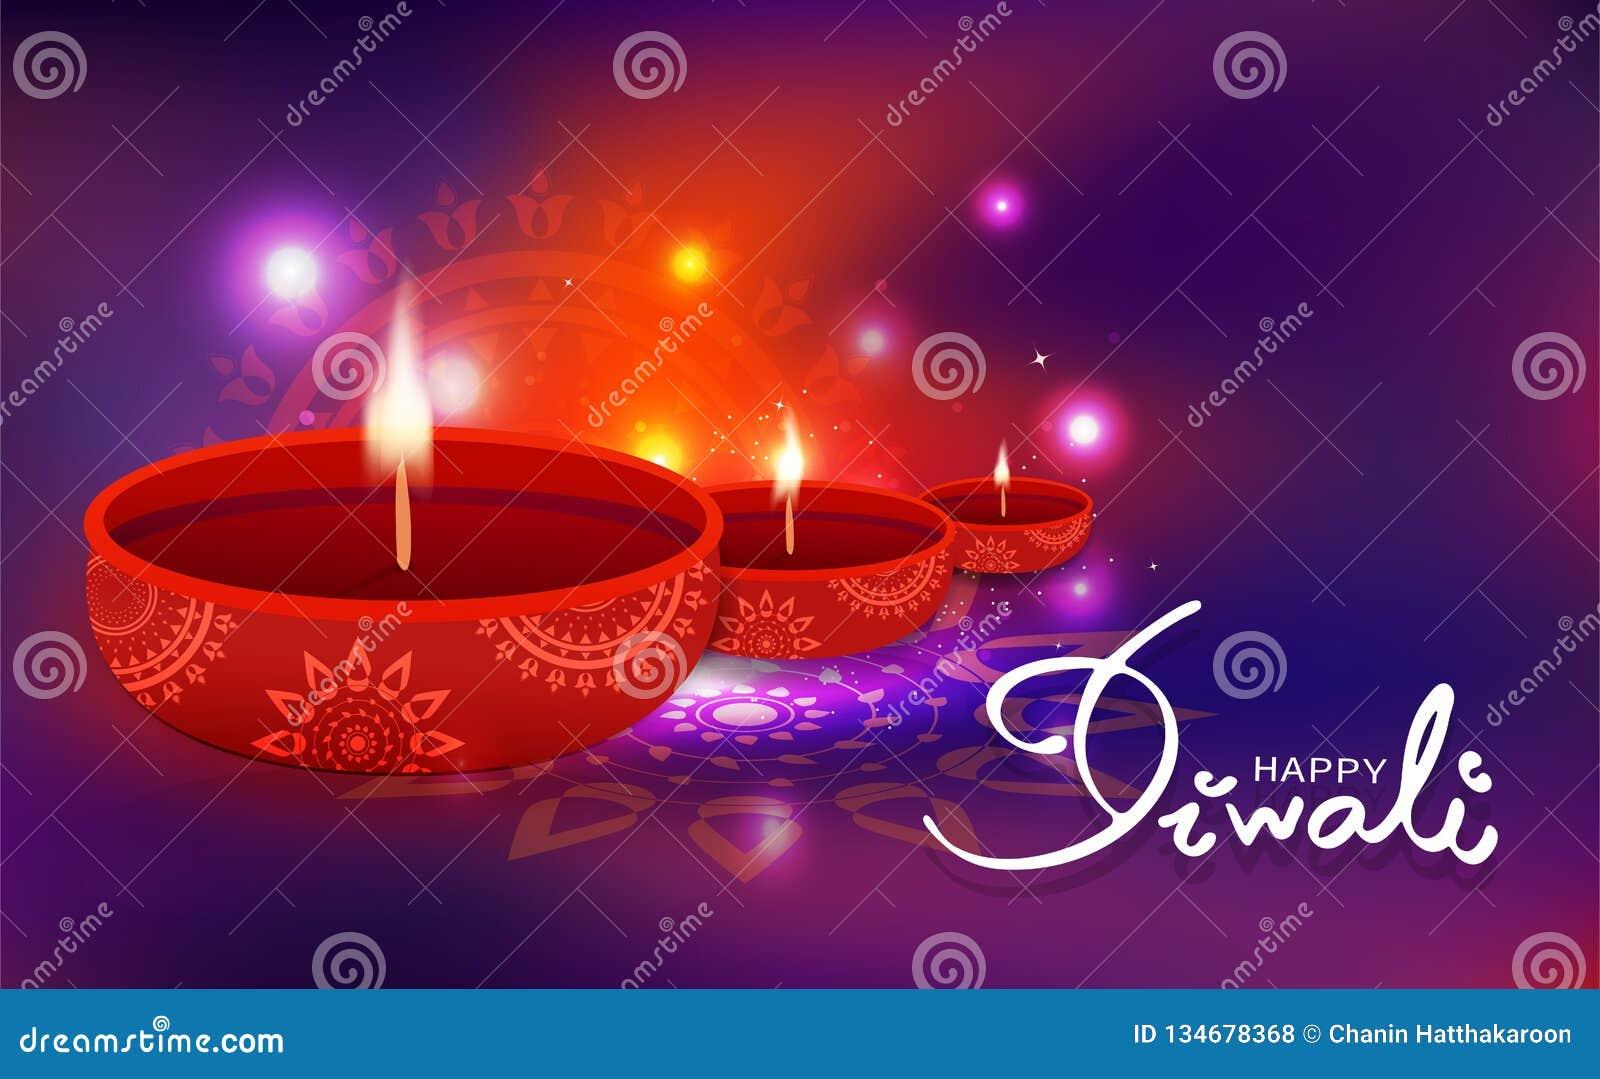 Diwali celebration, oil lamp decoration with floral mandala Hindu religion, light shiny festive blur background vector